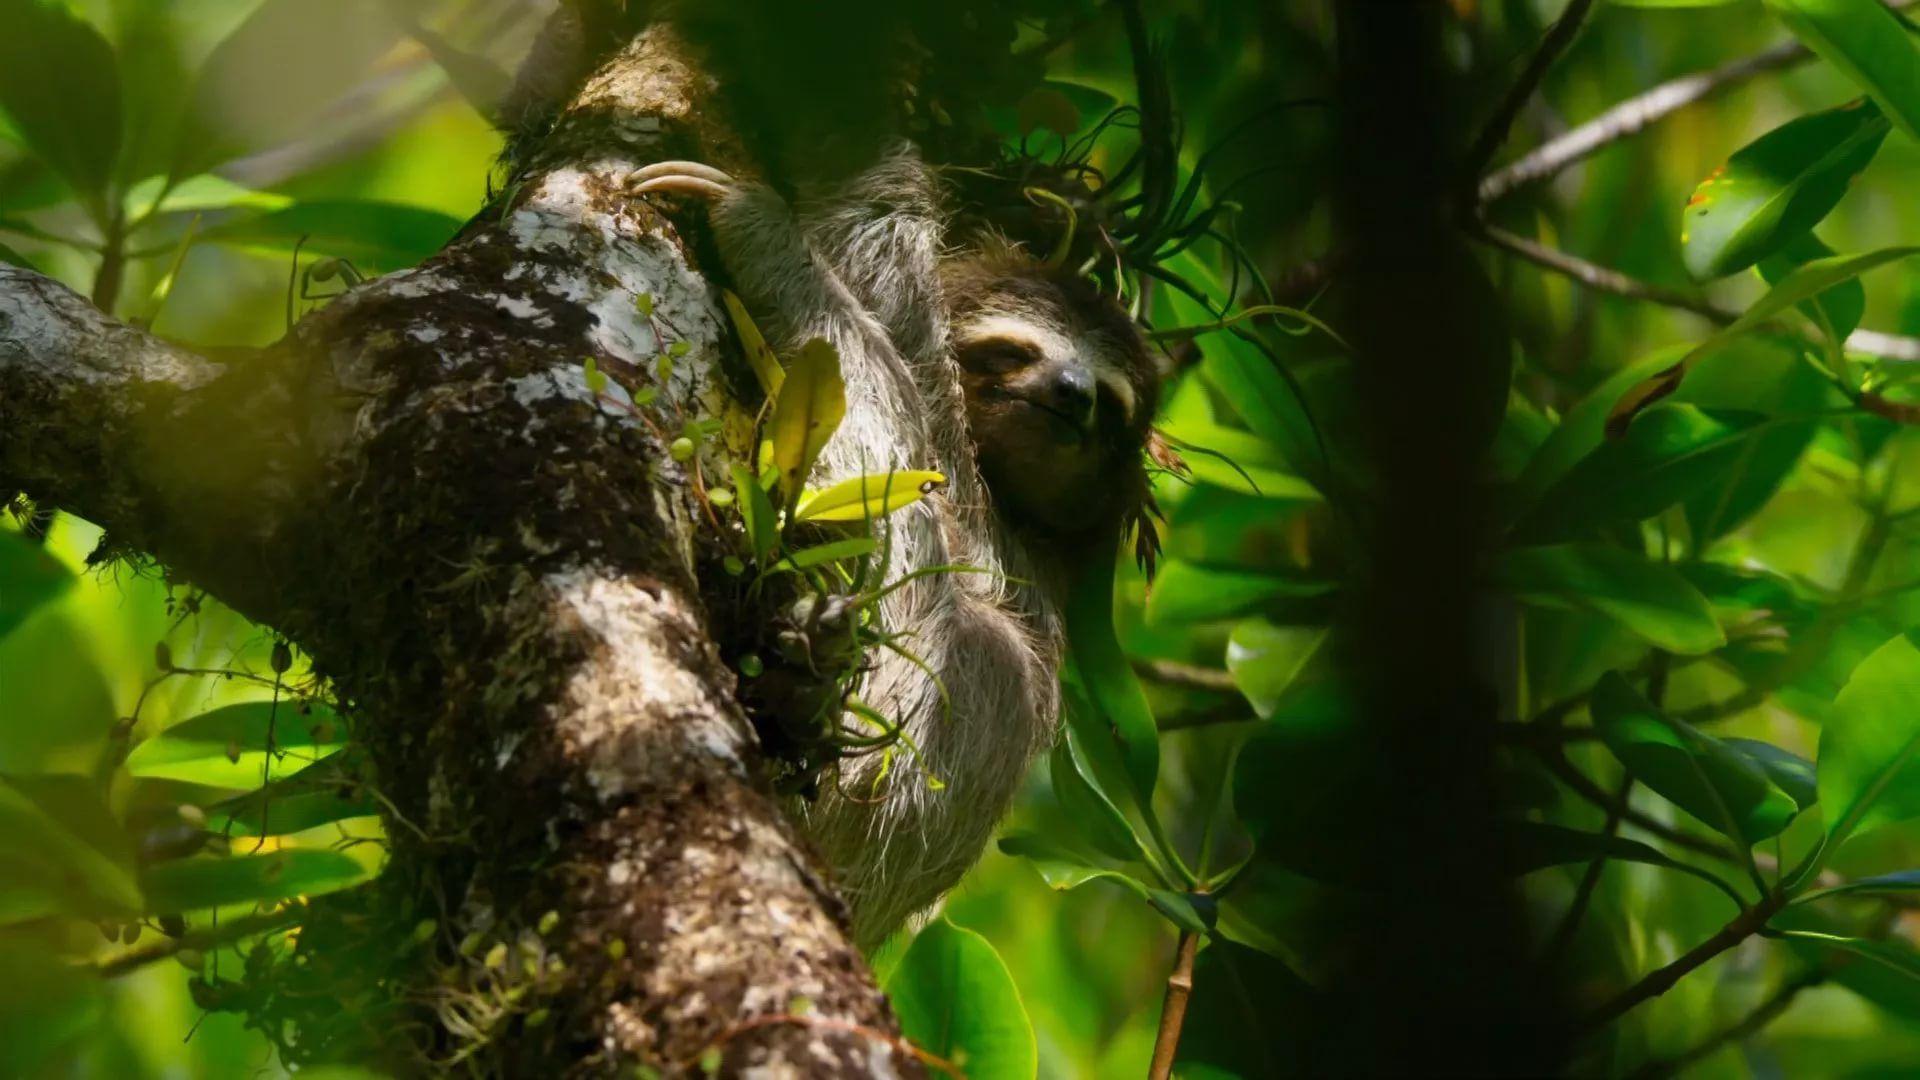 Sloth desktop wallpaper